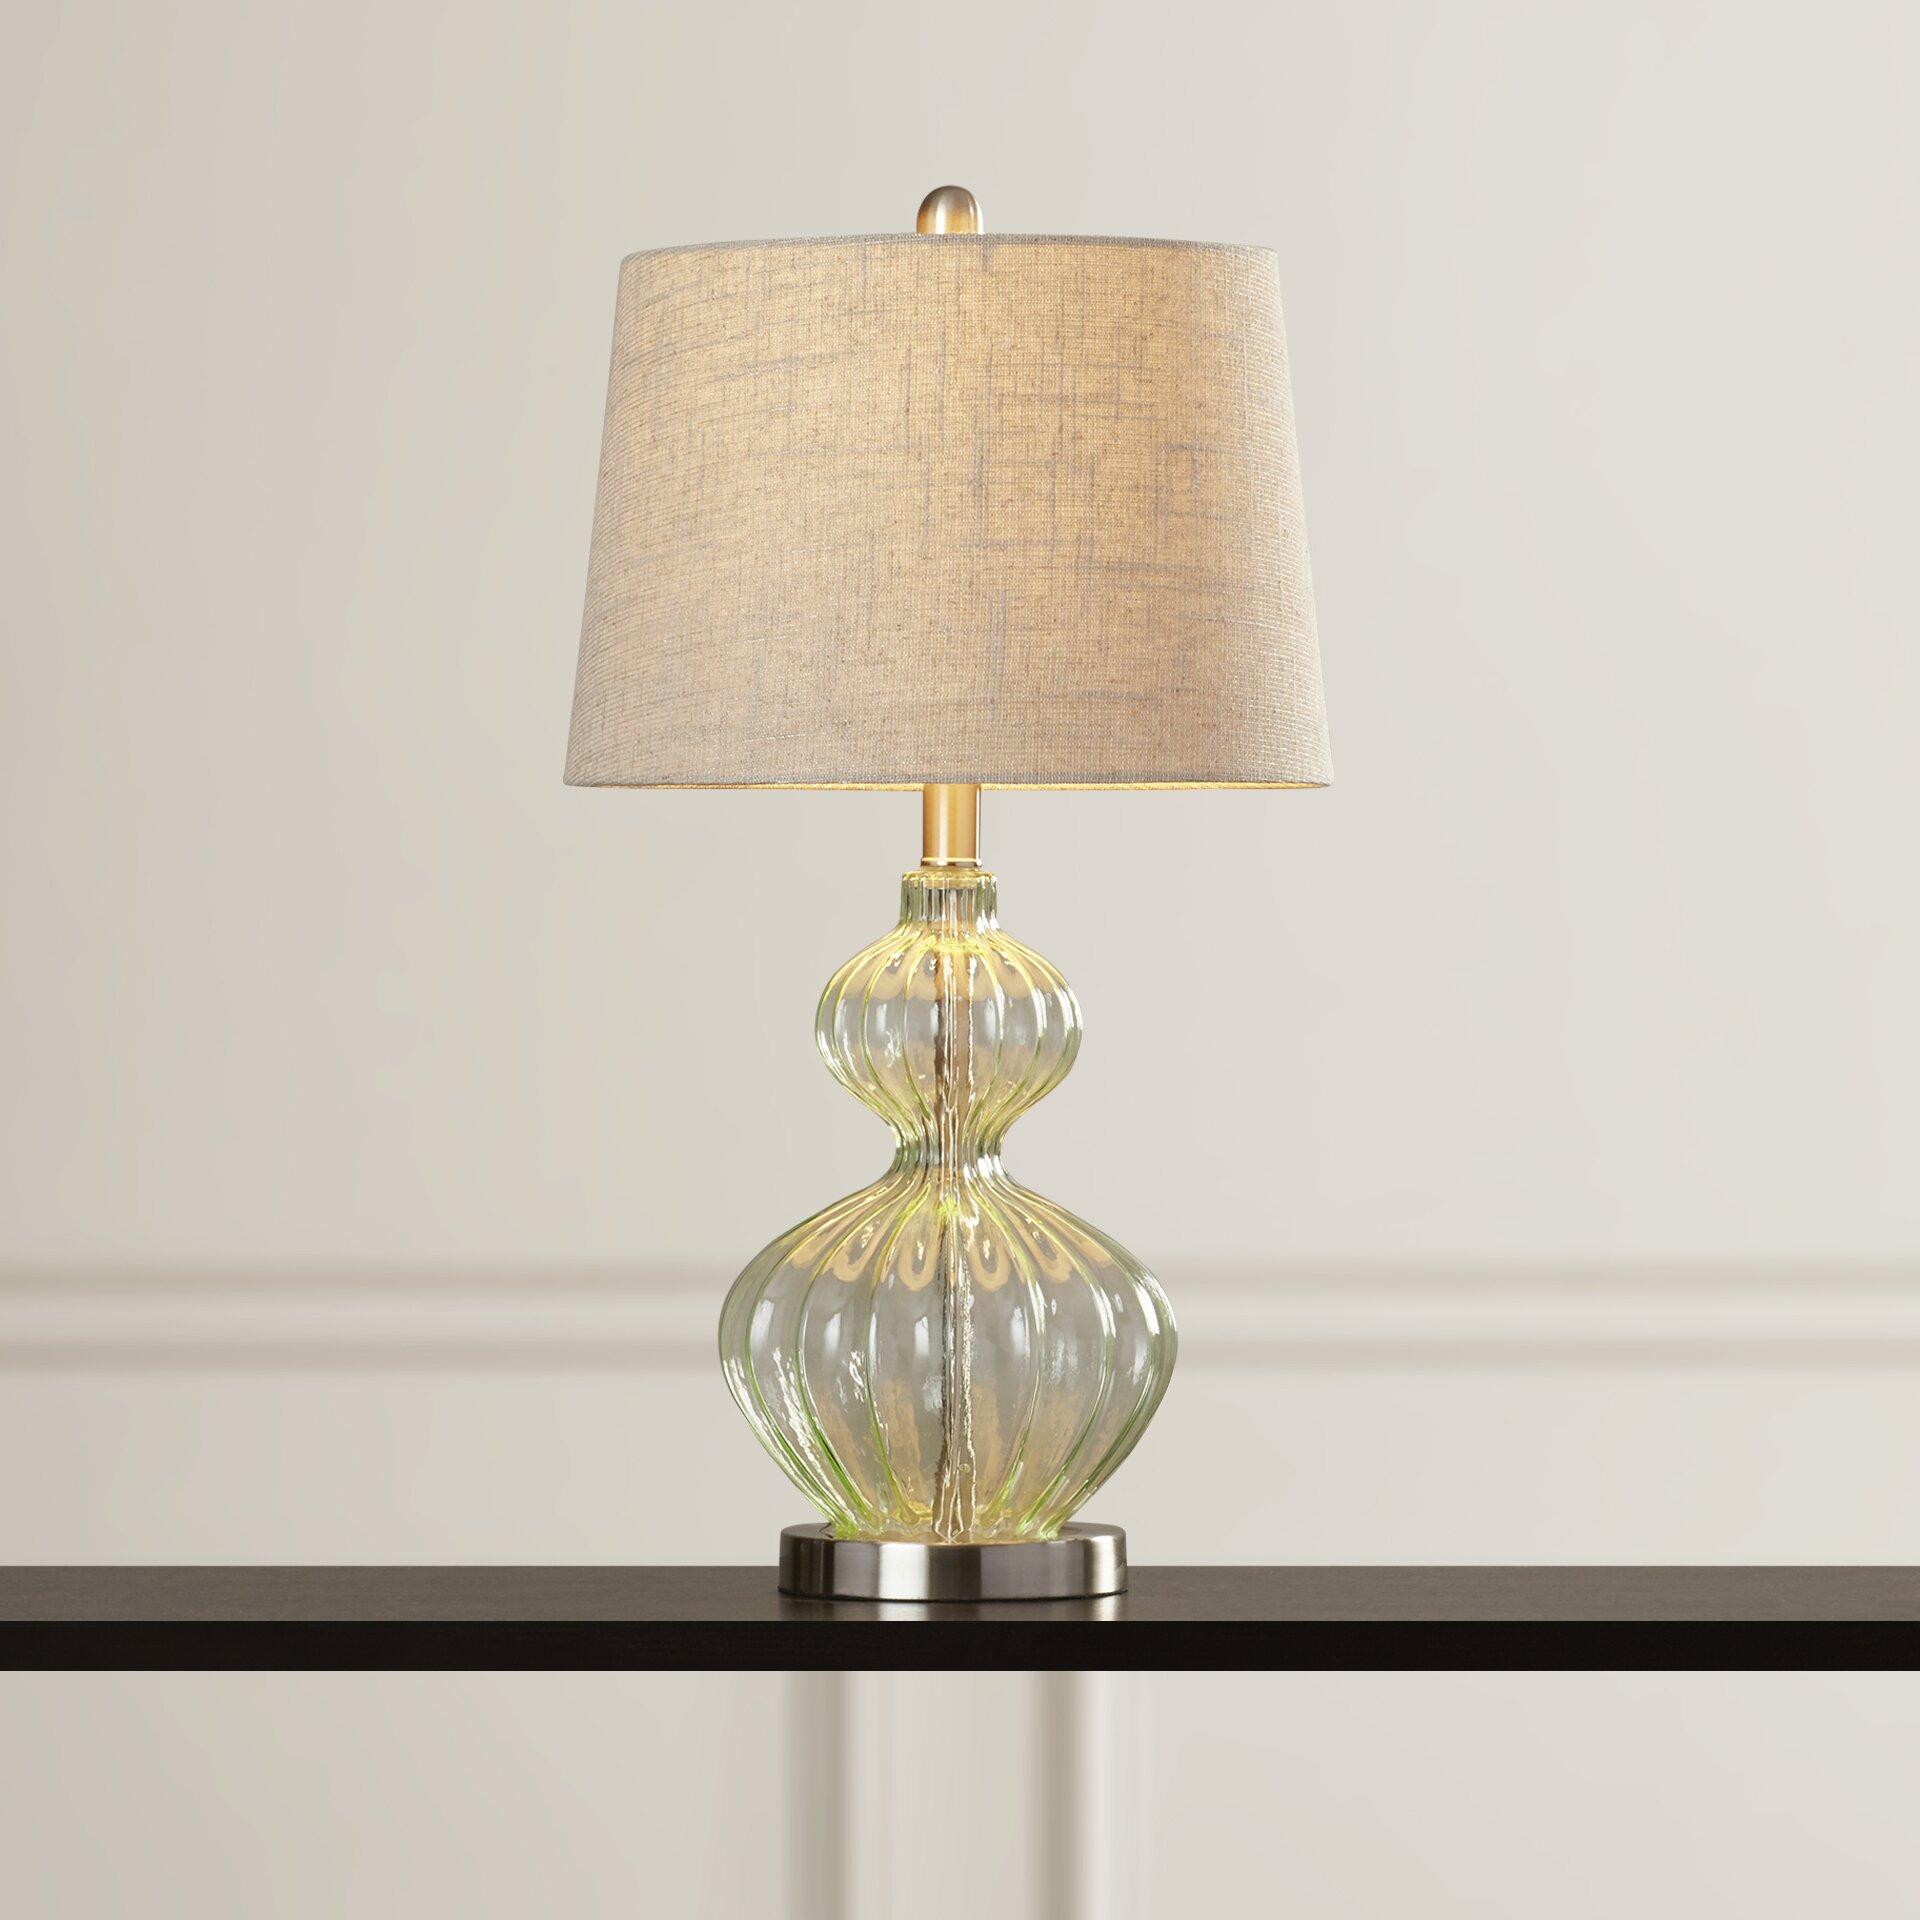 alcott hill kawaii 25 h table lamp reviews wayfair. Black Bedroom Furniture Sets. Home Design Ideas